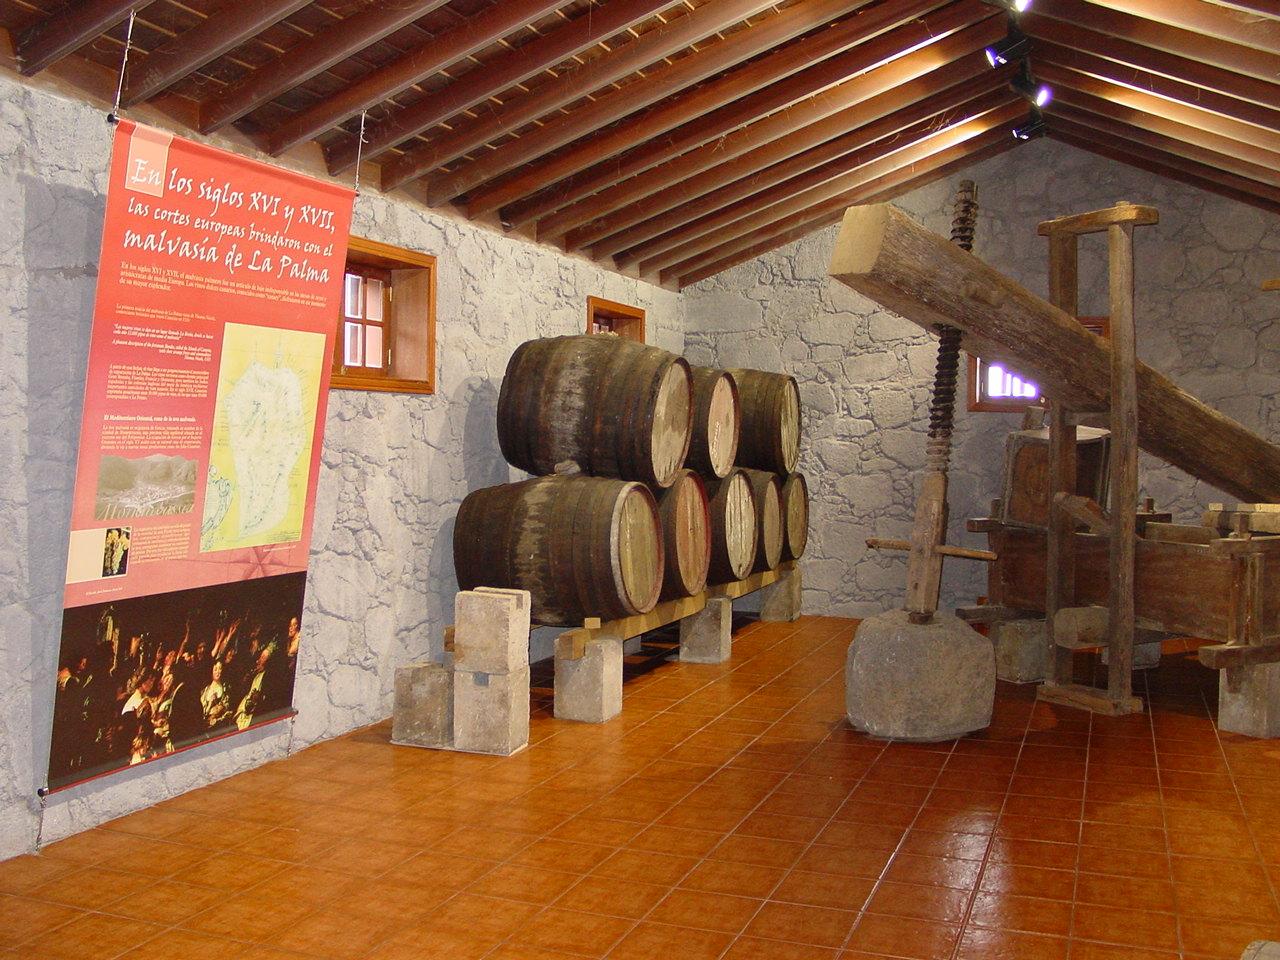 Centro de Visitantes Bodega de Barlovento, La Palma